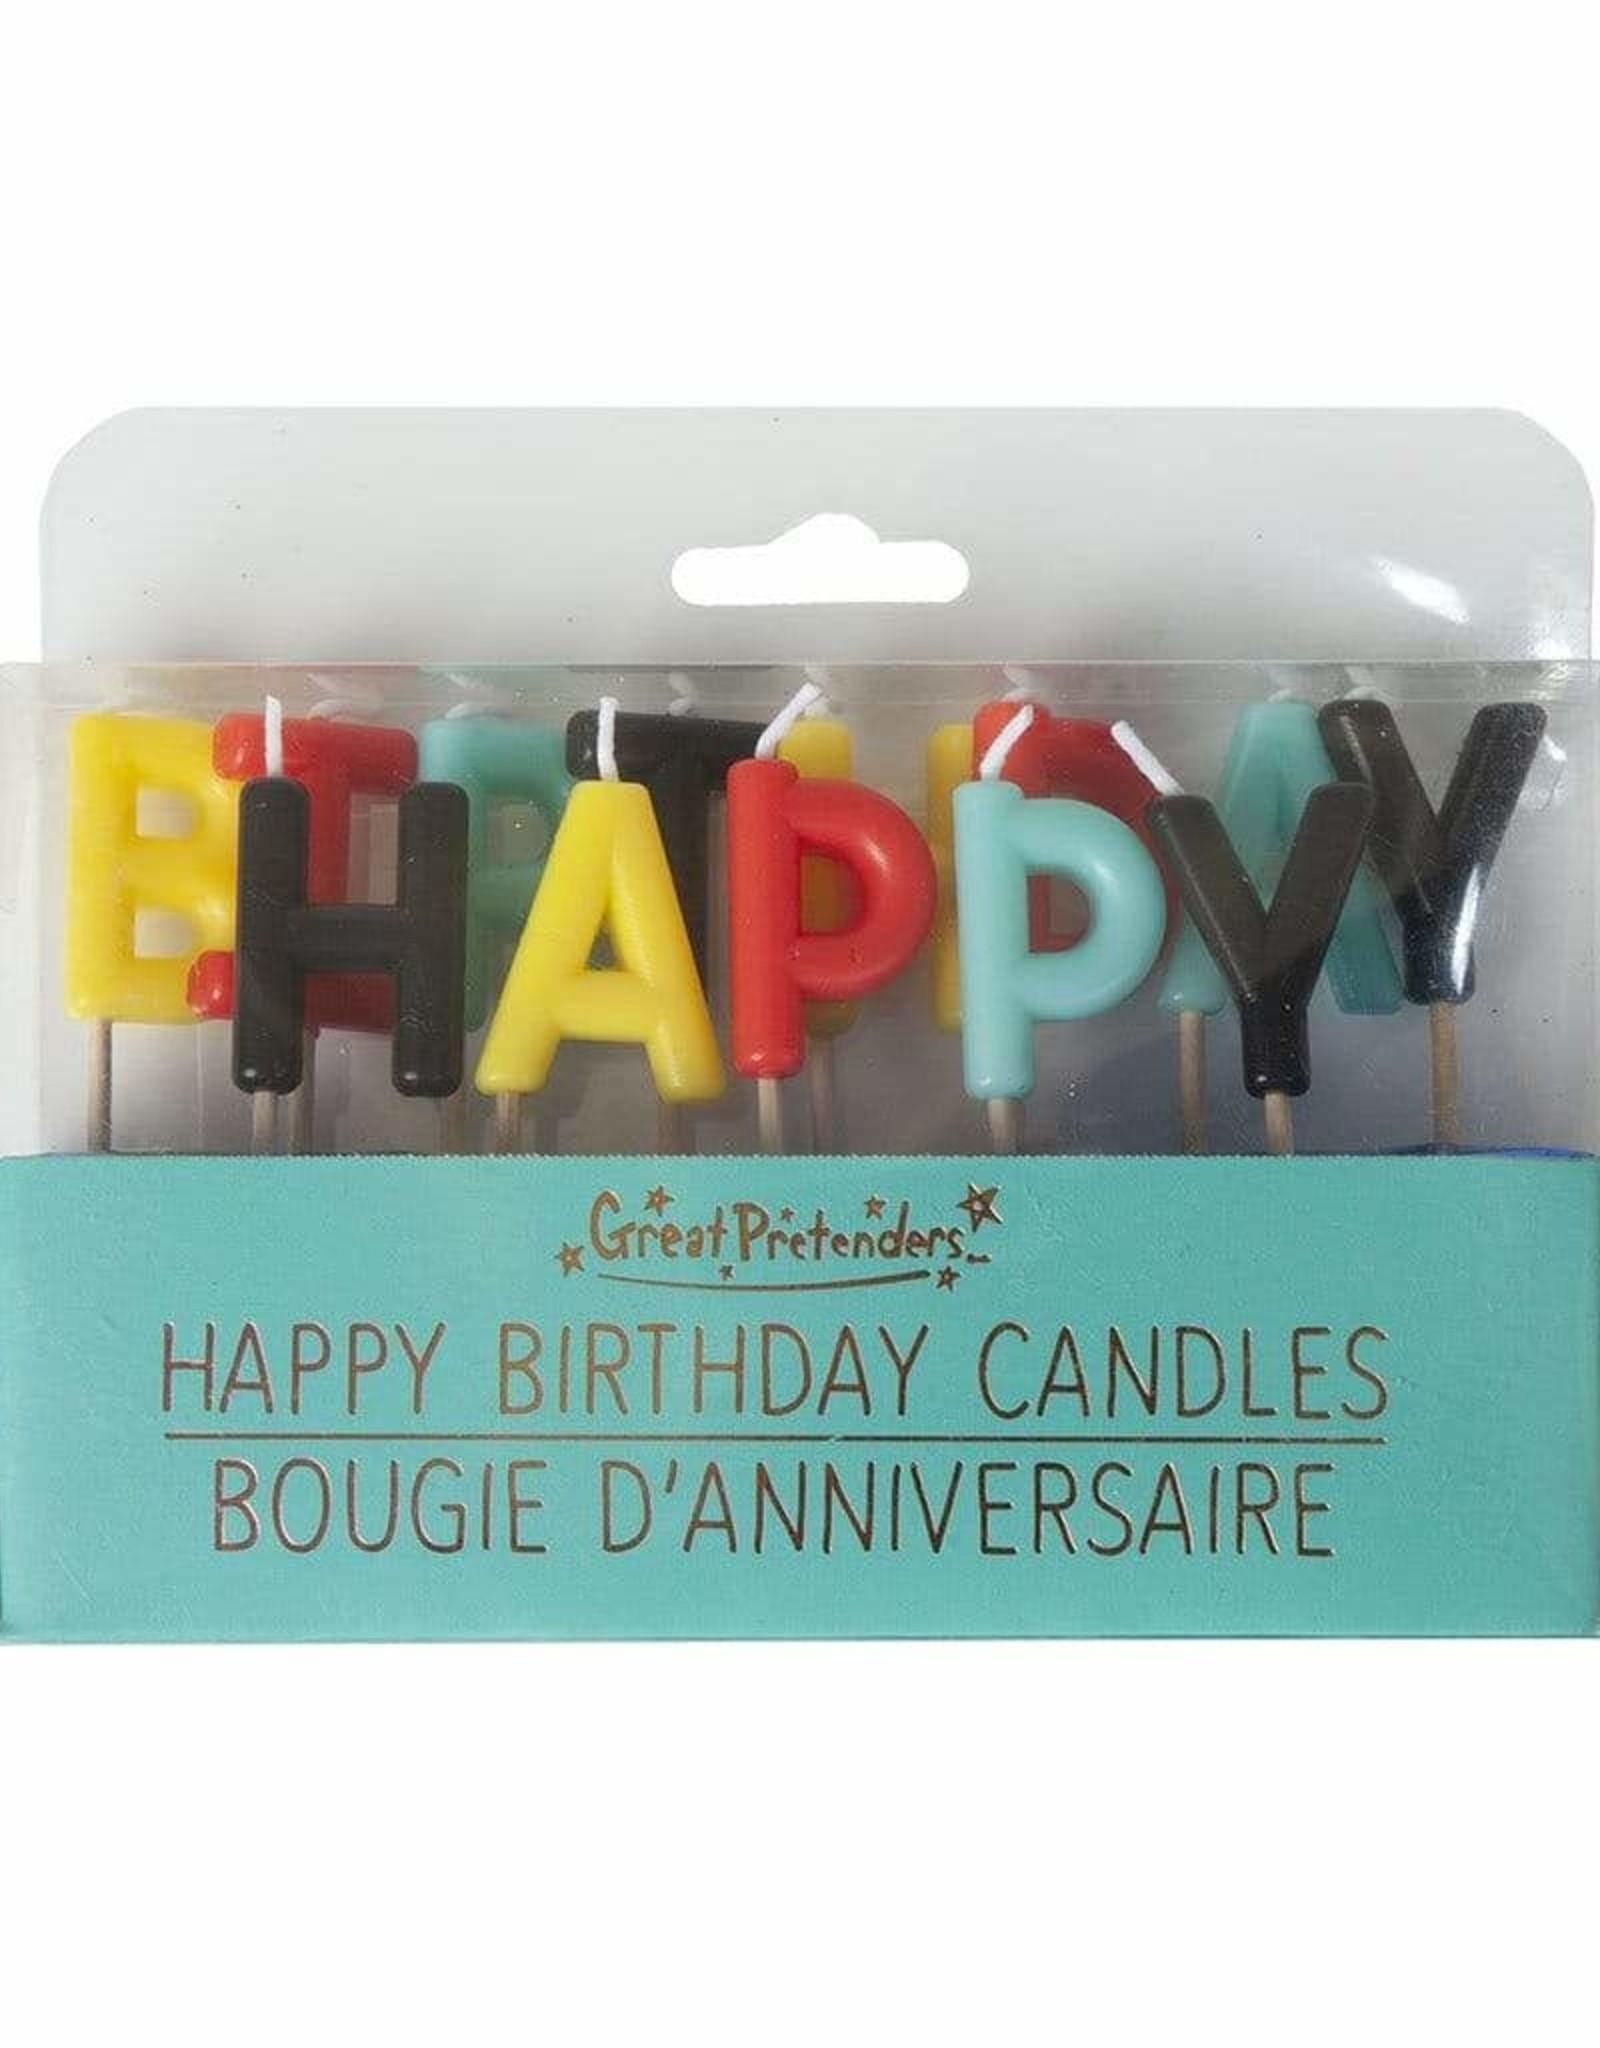 Great Pretenders Happy Birthday Candles - Multicoloured